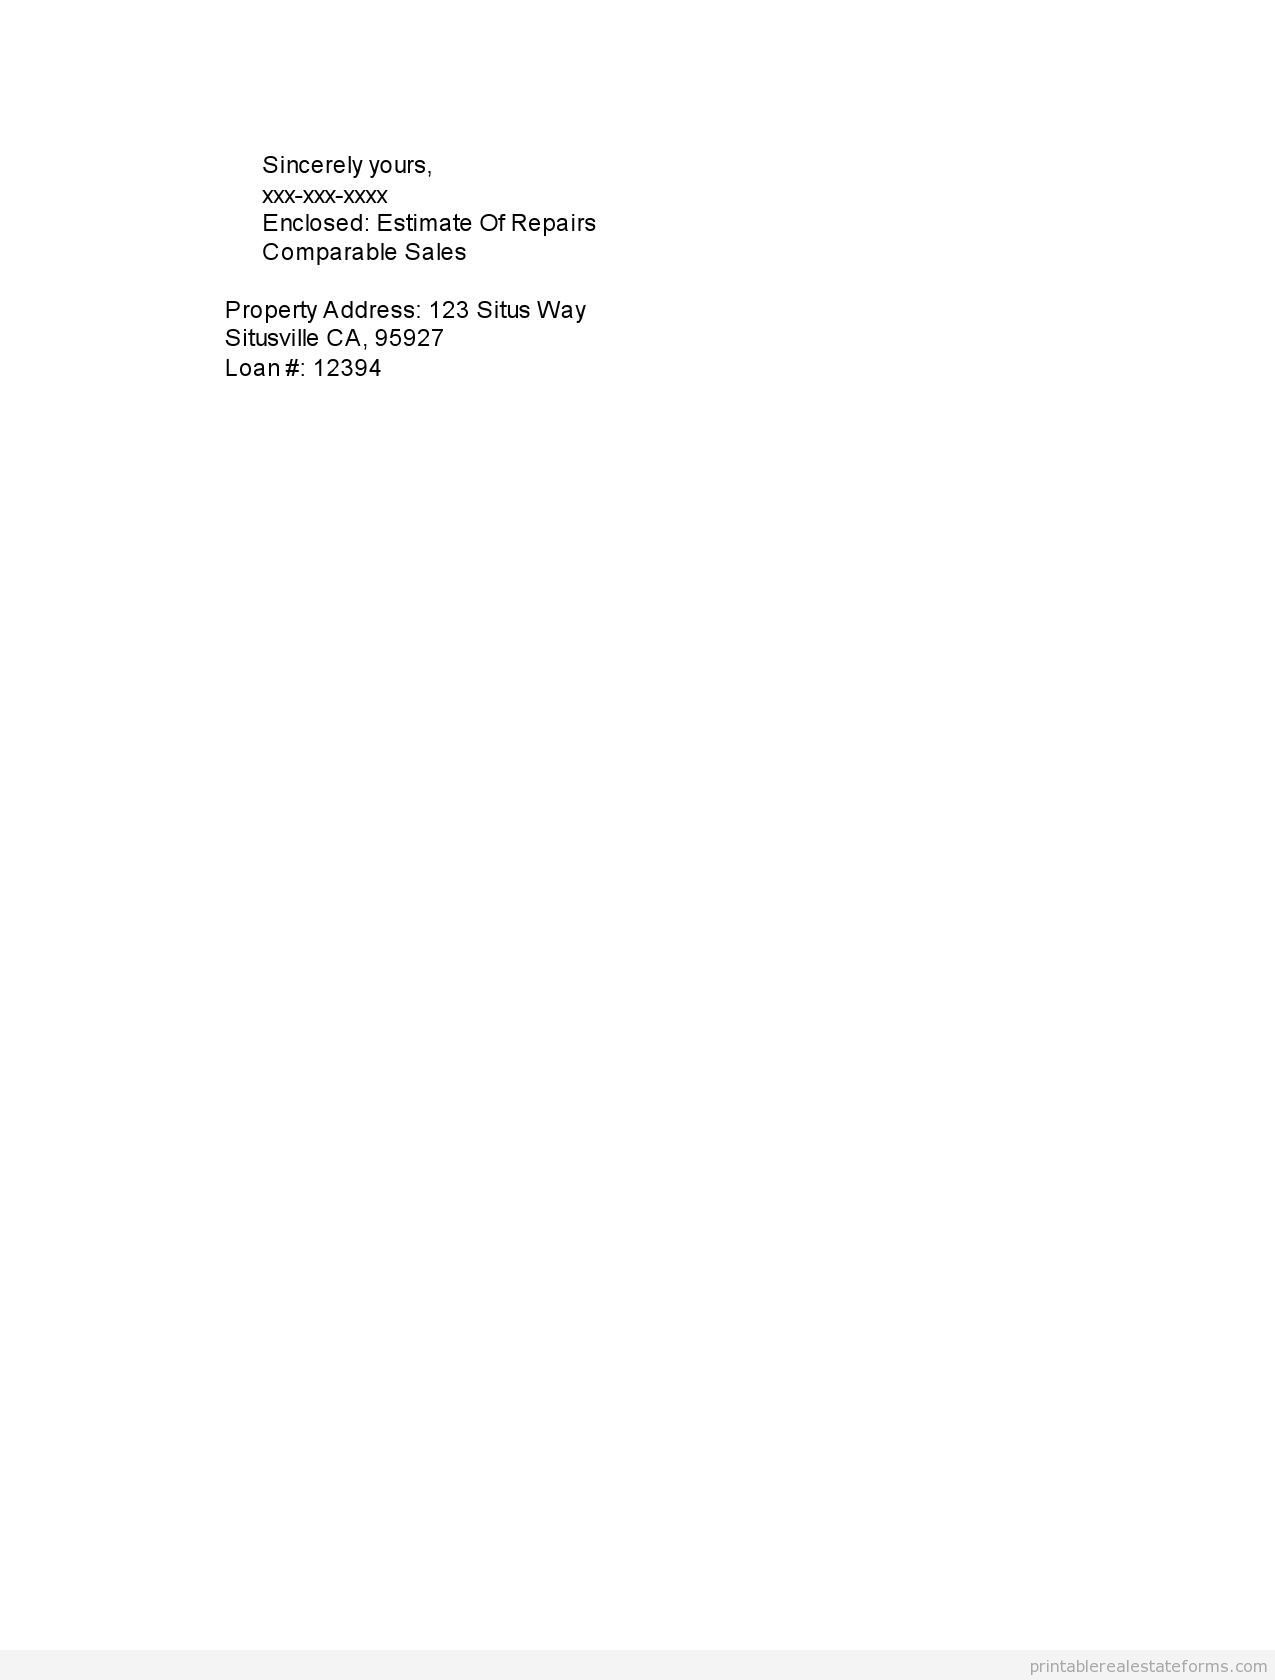 Sample Printable Bpo Letter To Bank Form  Sample Real Estate